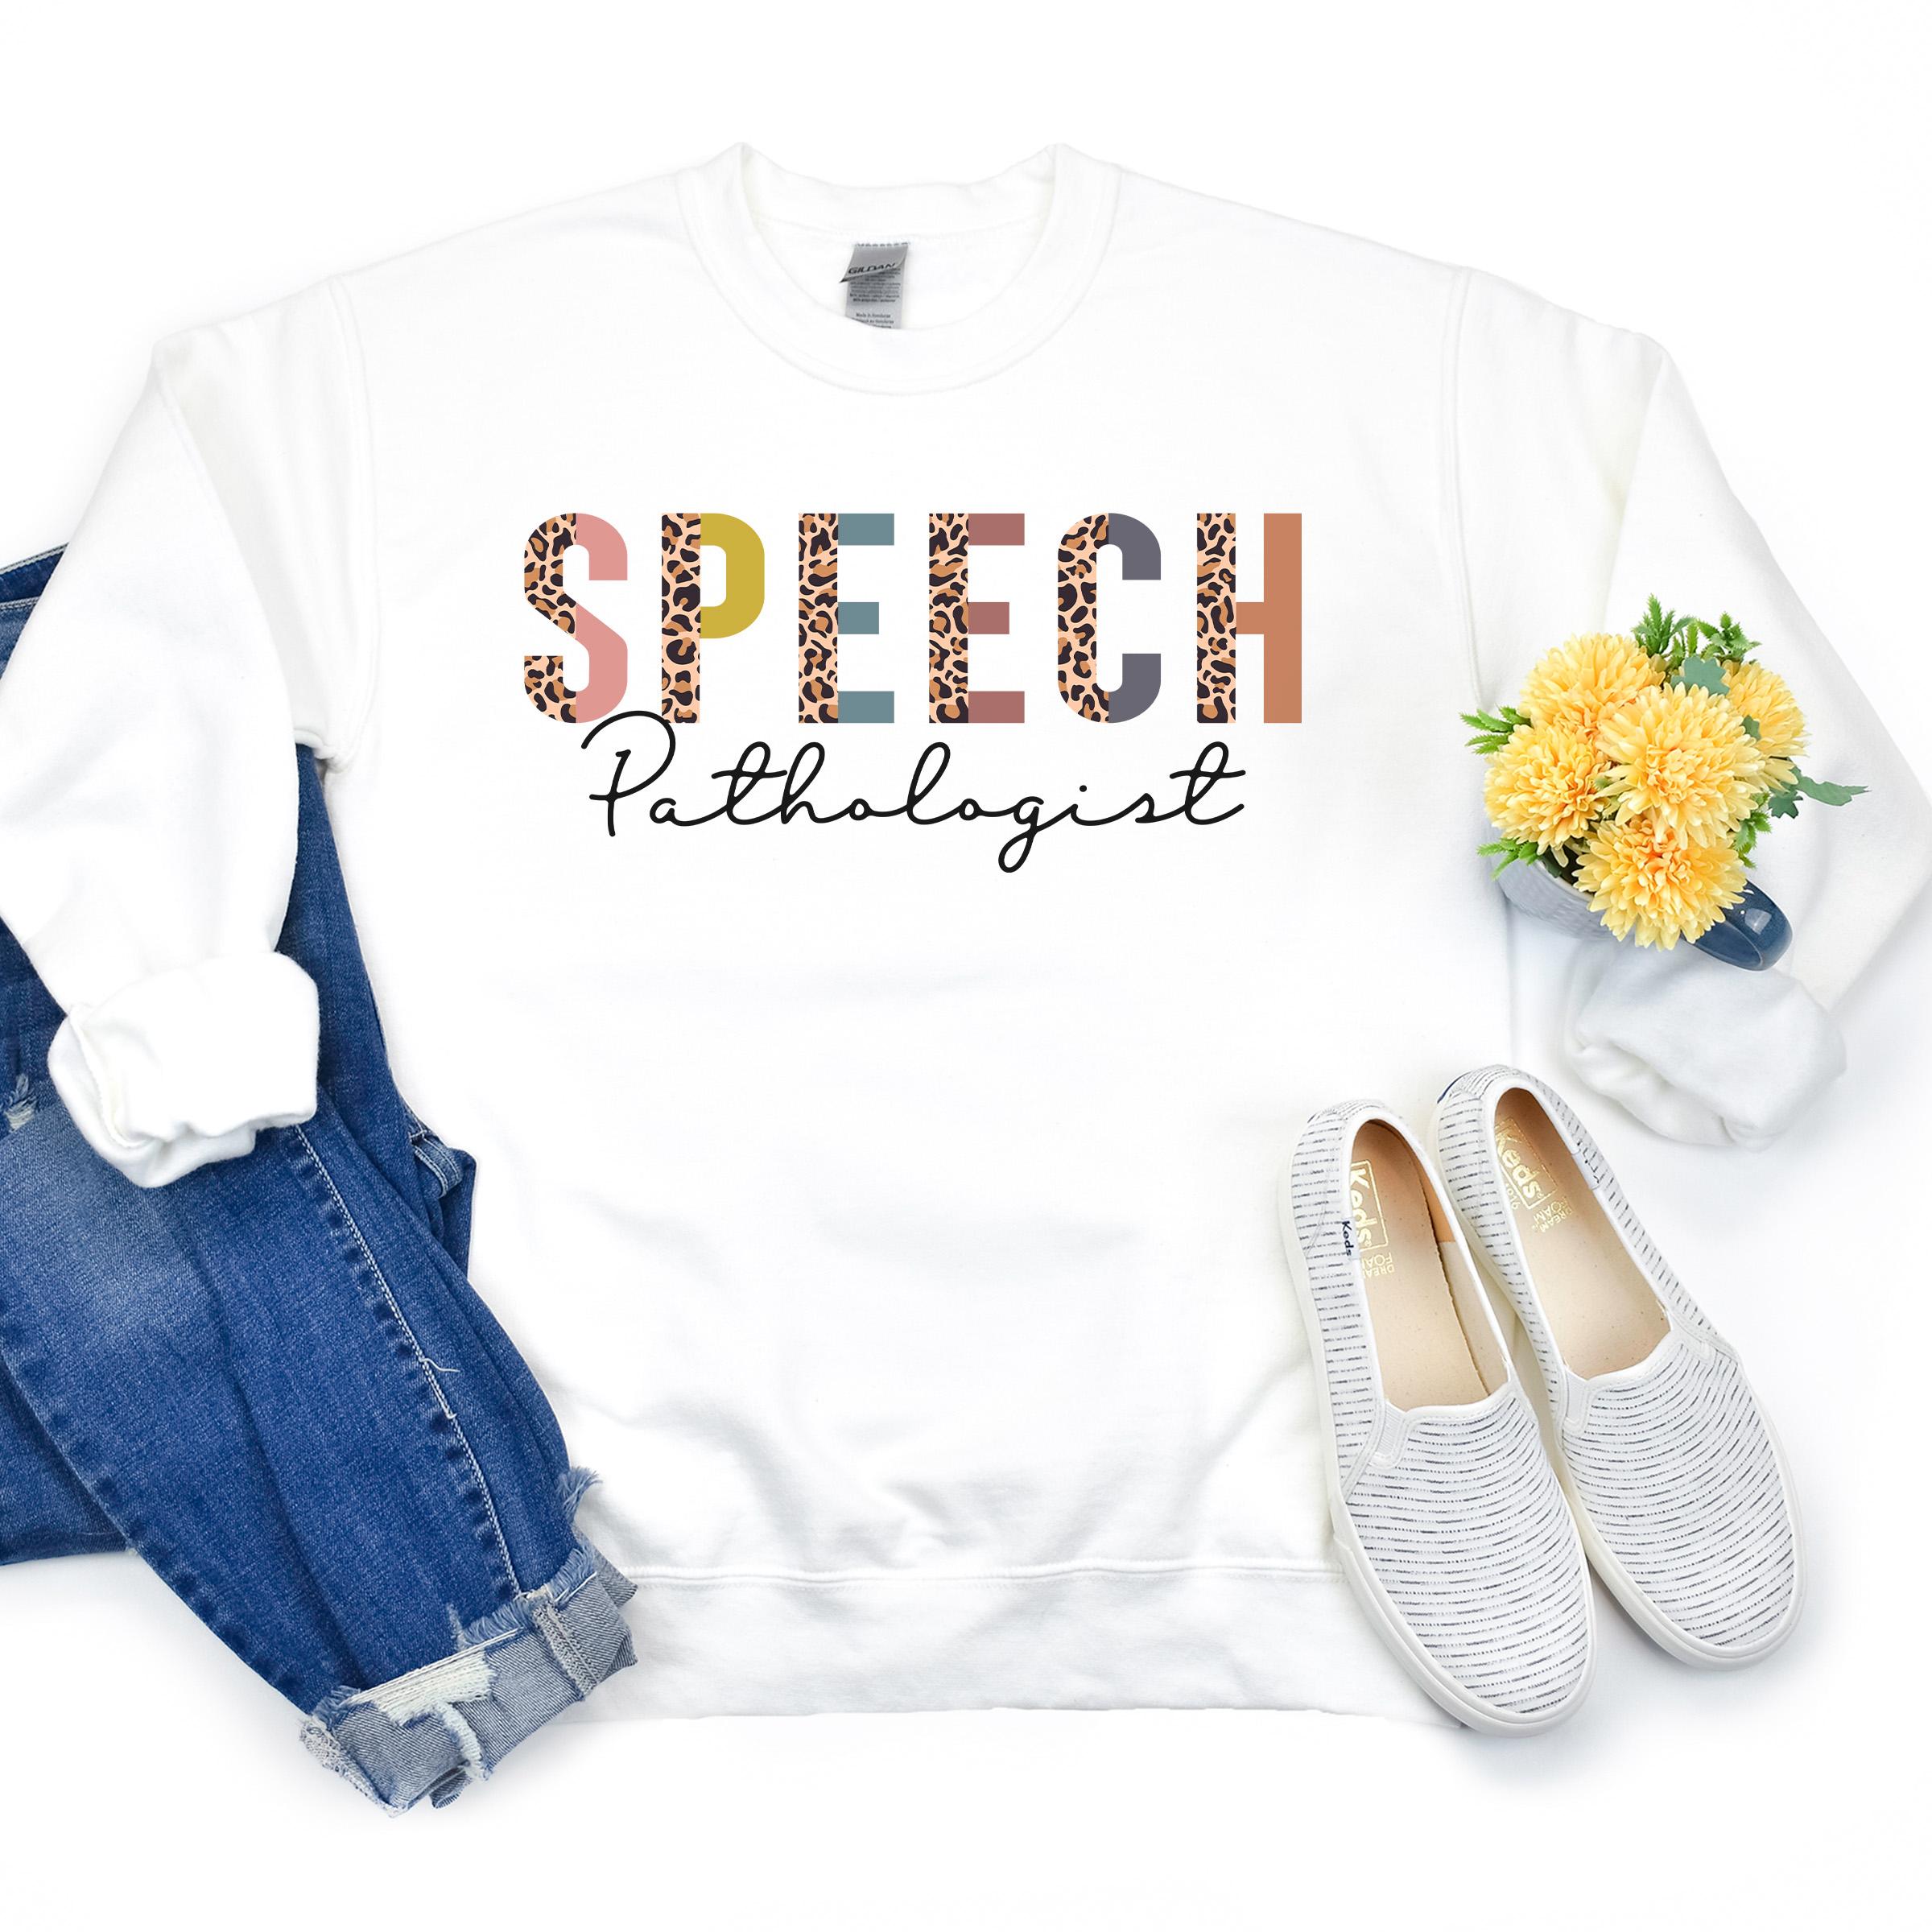 Speech Pathologist   Language Therapy   Speech Pathology   Speech Path Therapist   Expressive Language   Unisex Crewneck Sweatshirt